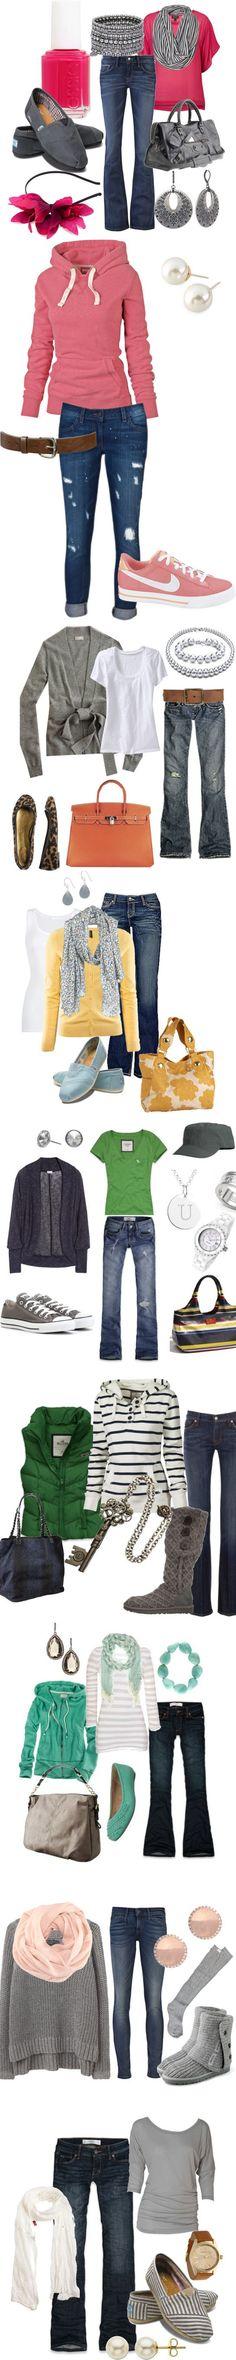 http://www.honeybearlane.com/wp-content/uploads/2012/08/Comfortable-Fall-Looks.jpg